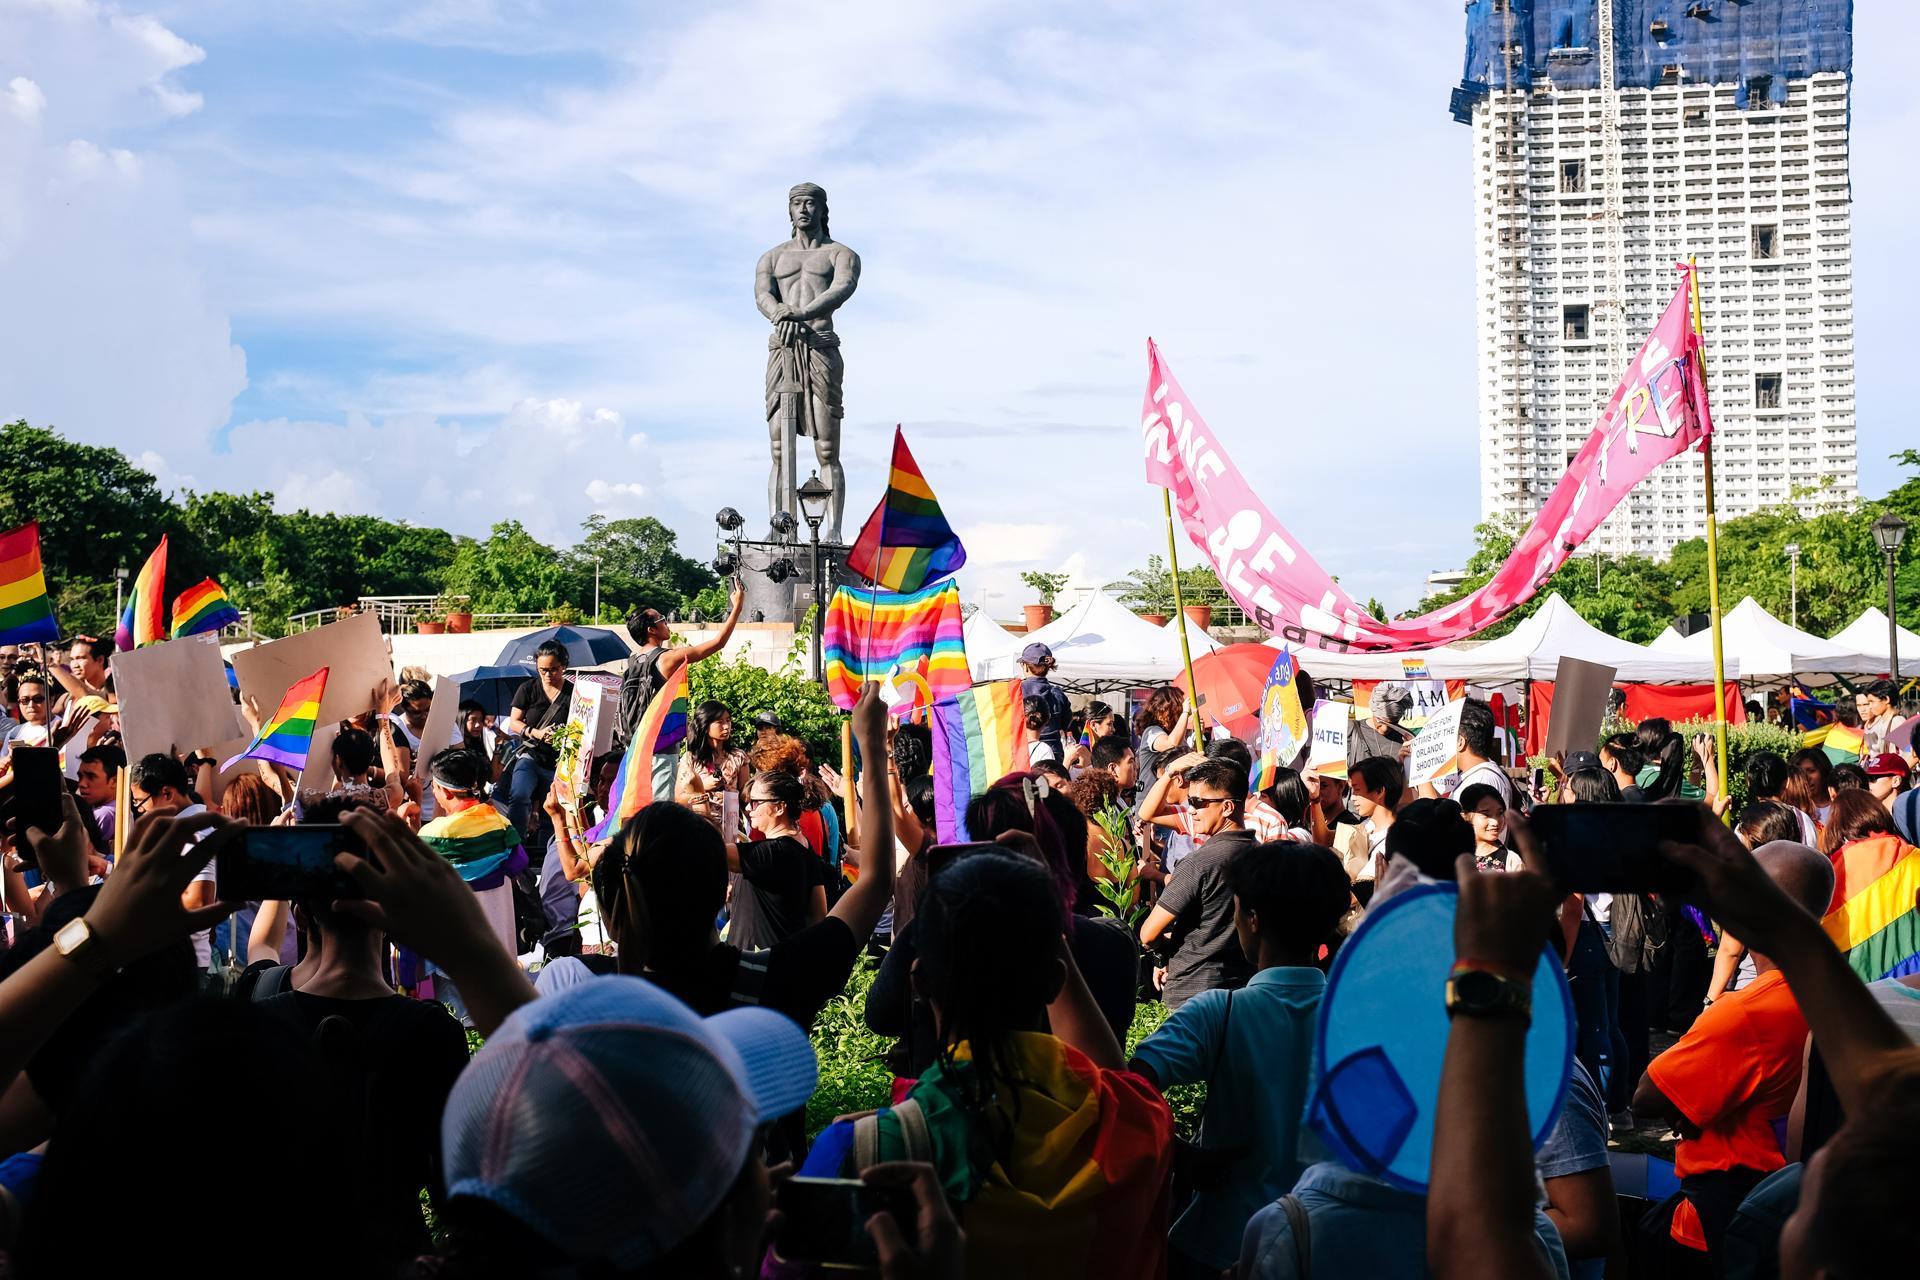 Metro Manila Pride March 2016, Philippines (2016)